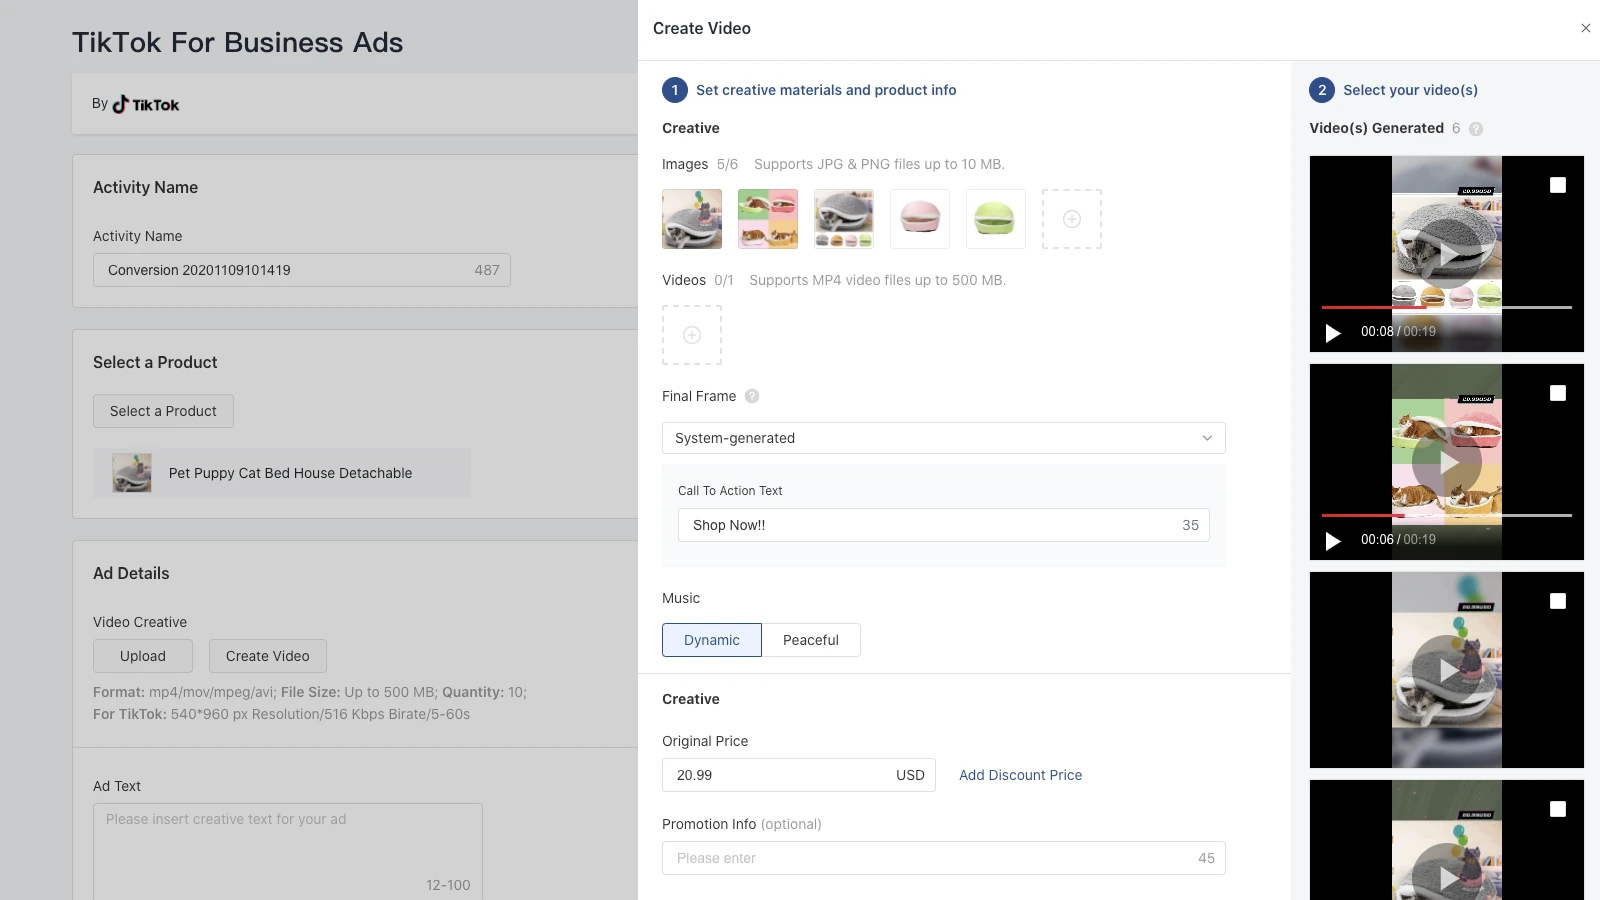 Creating video ads inside the TikTok app for Shopify